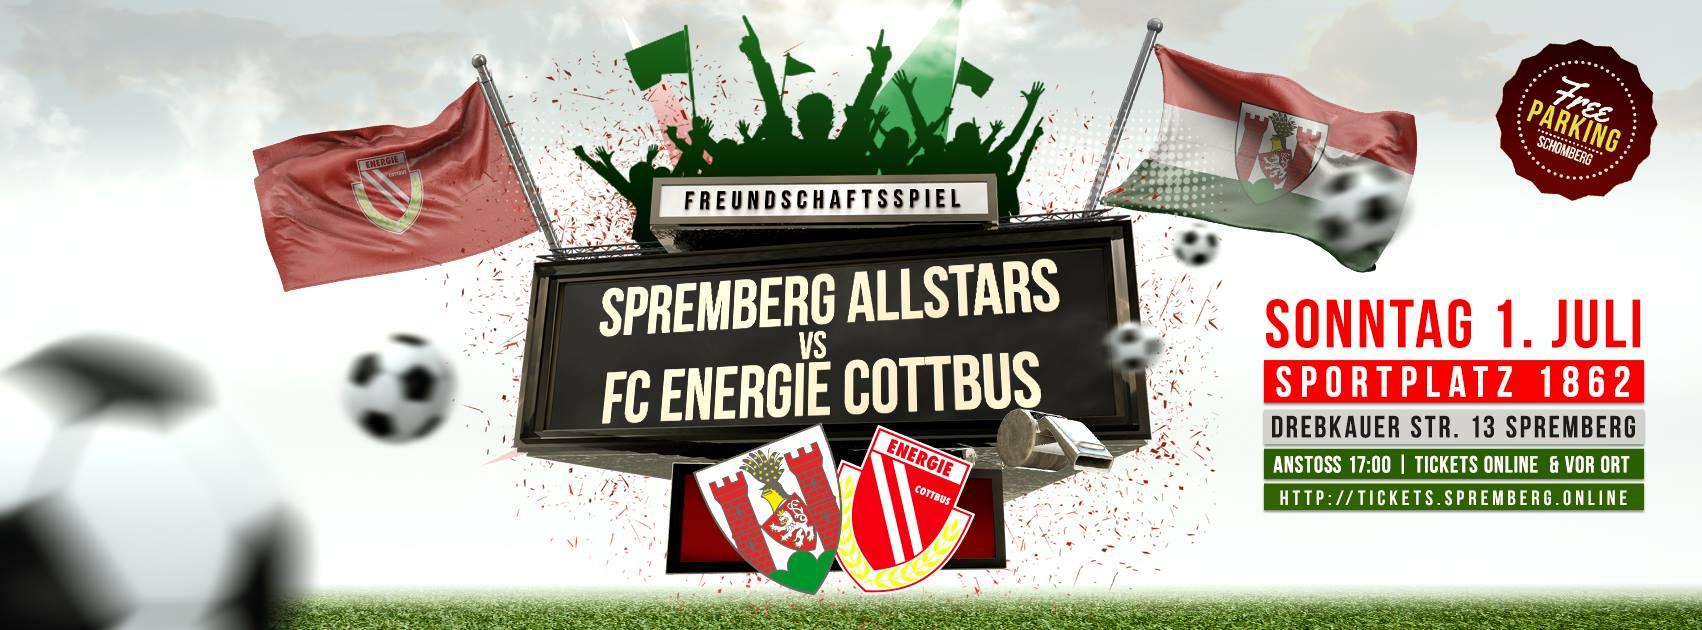 Spremberg Allstars vs. Energie Cottus